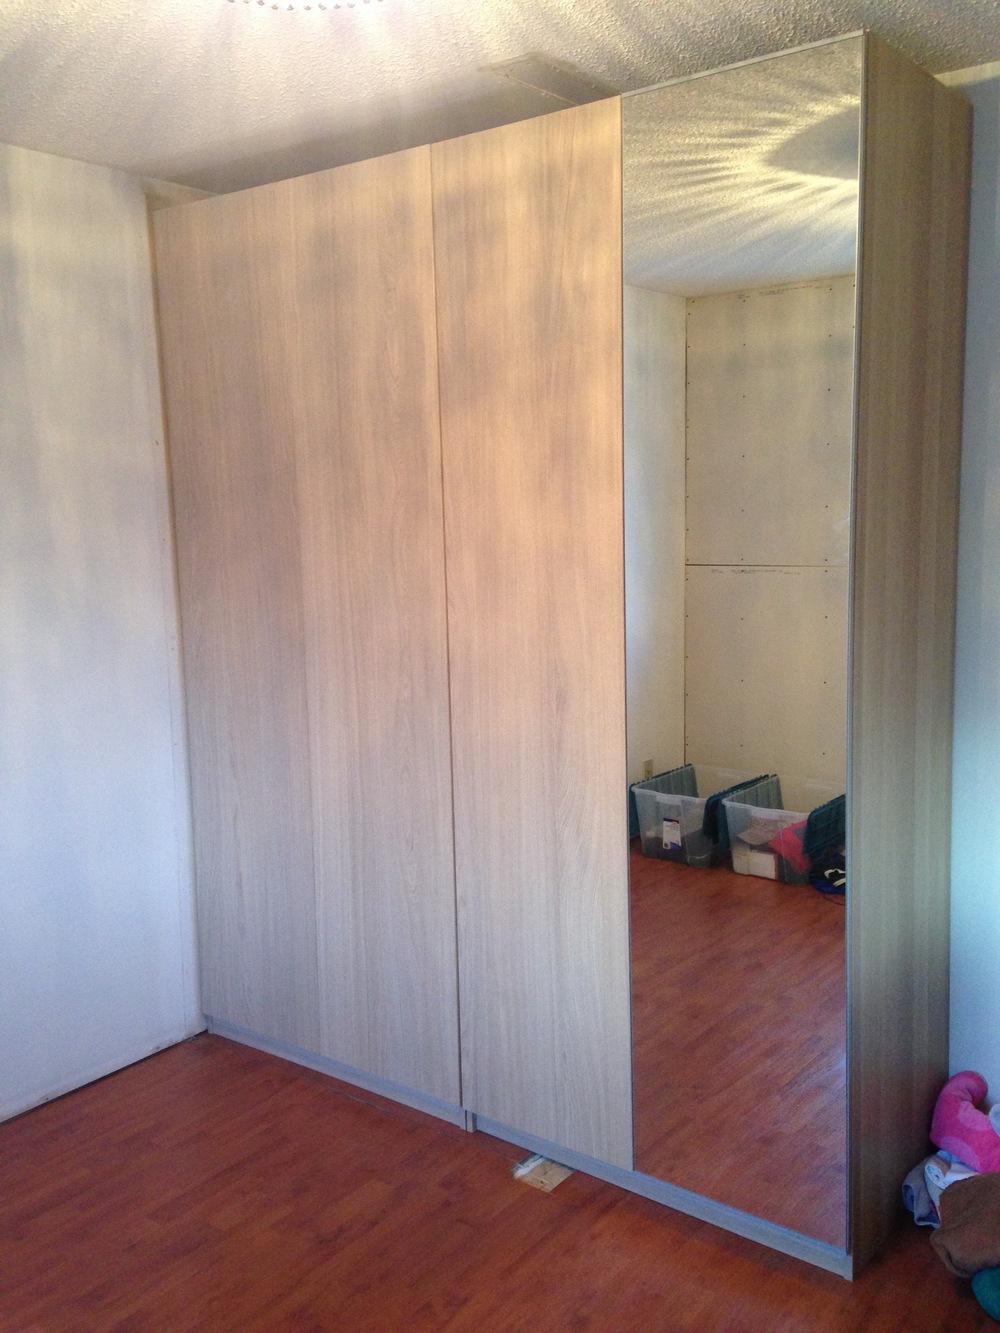 Interior Design Calgary, Home Decor & House Plans | IKEA Closet Finished | Dutch Touch Interiors